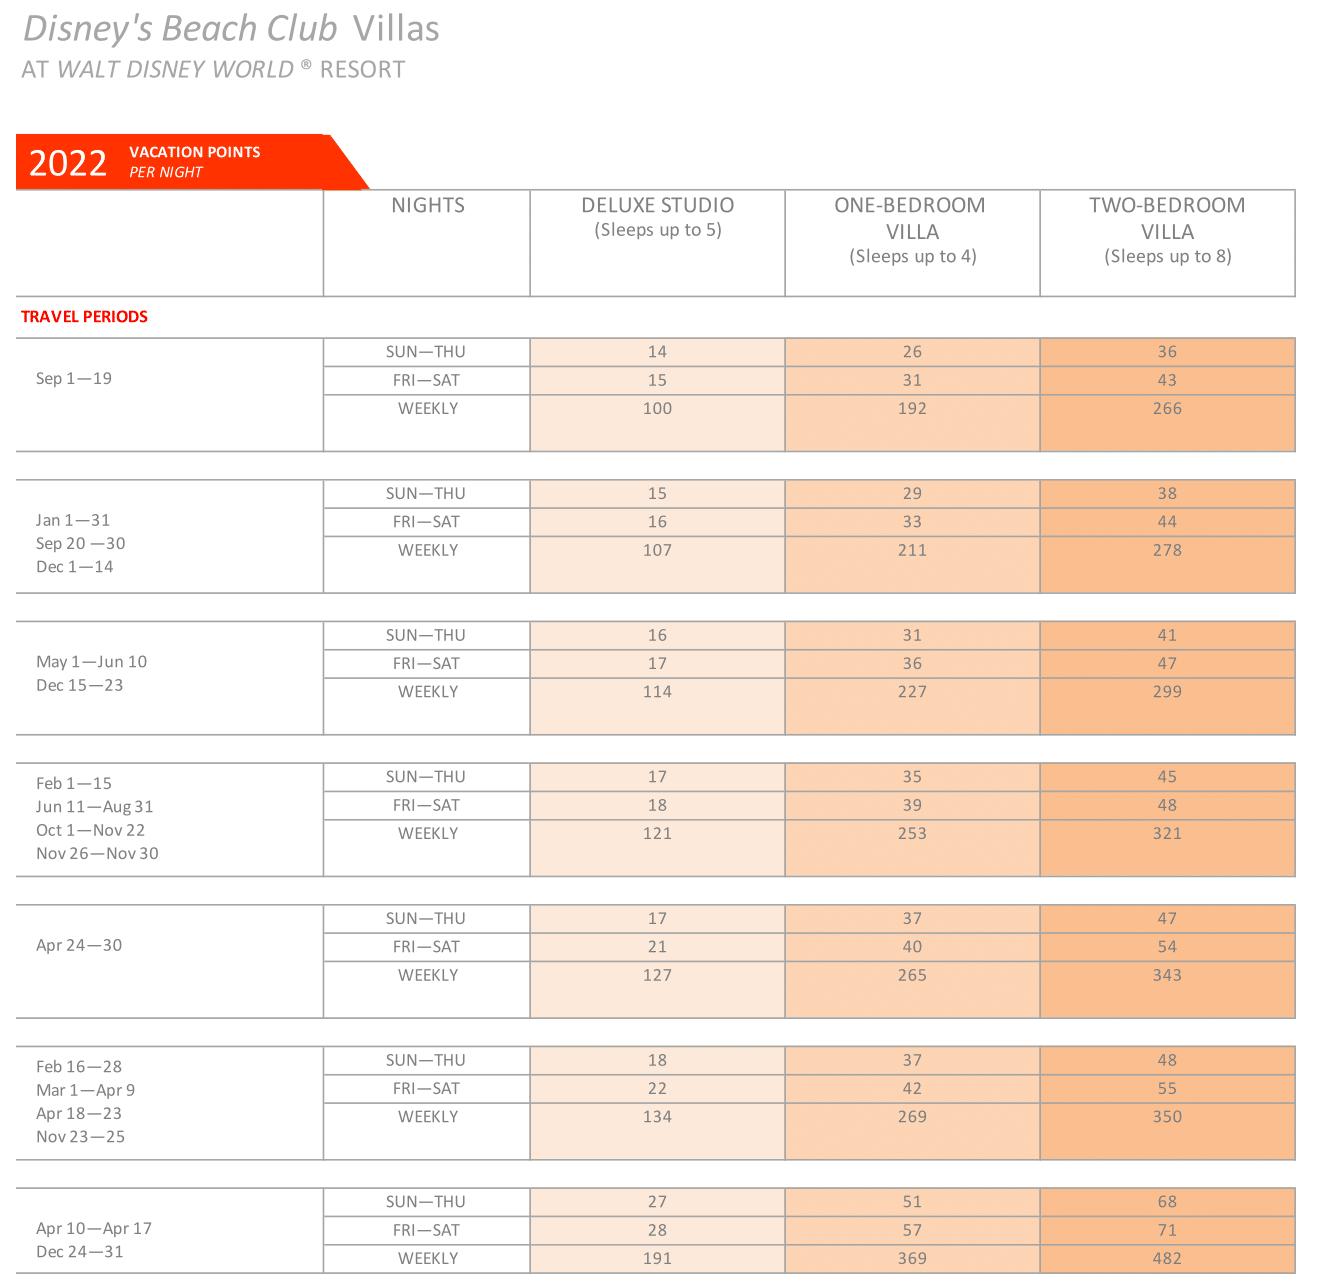 Disney's Beach Club 2021 DVC points chart